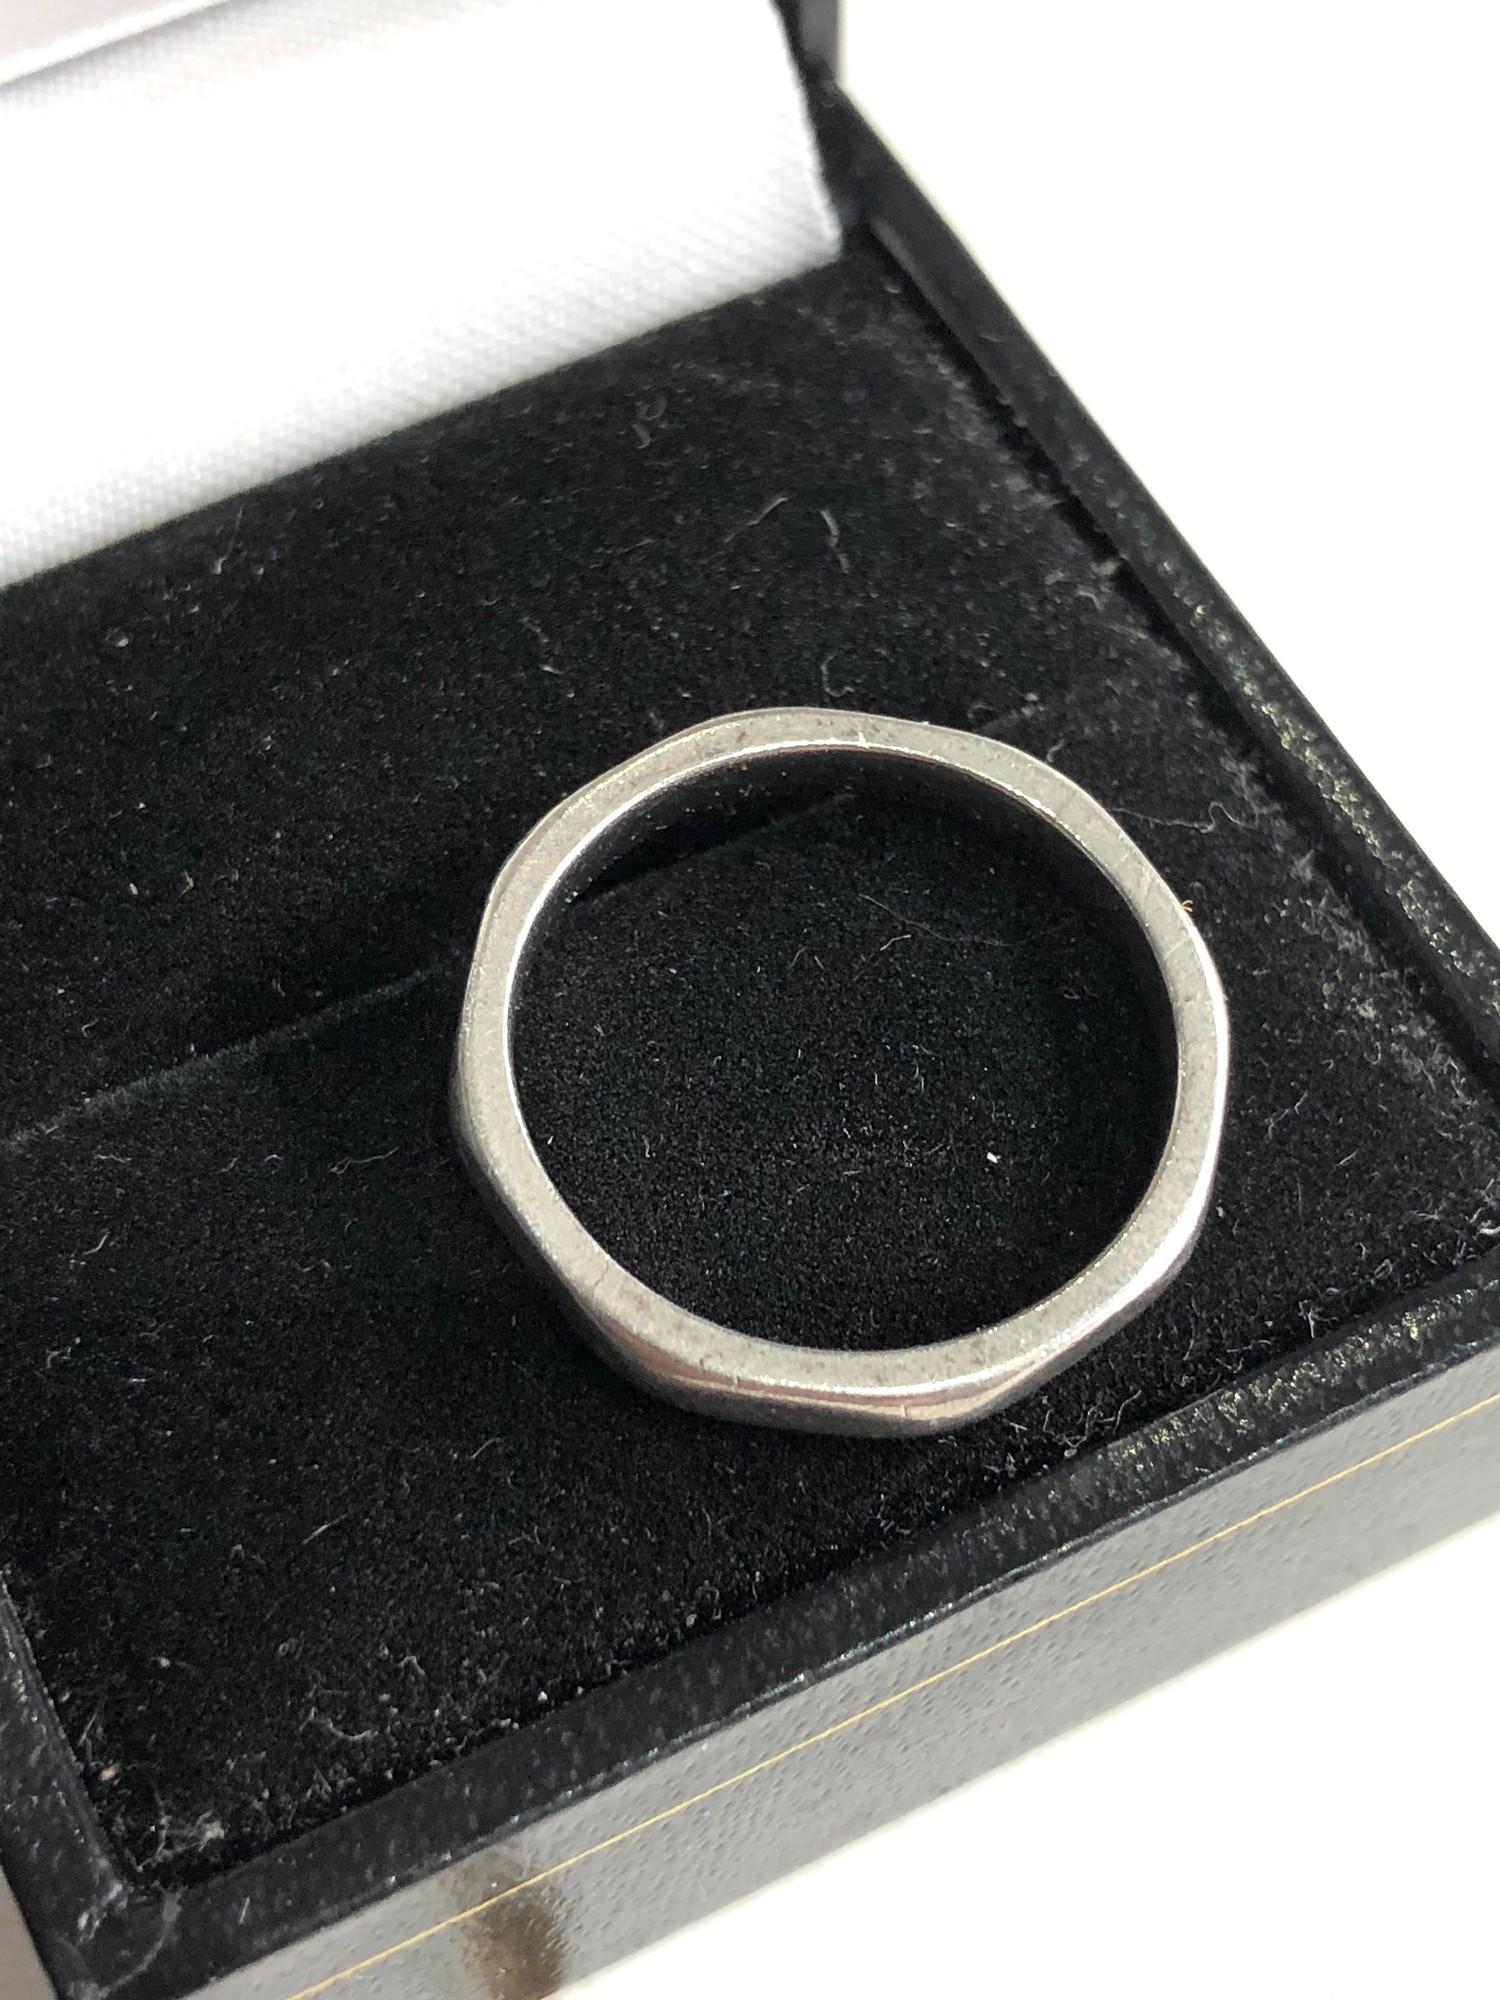 Platinum ring weight 4.5g - Image 2 of 4